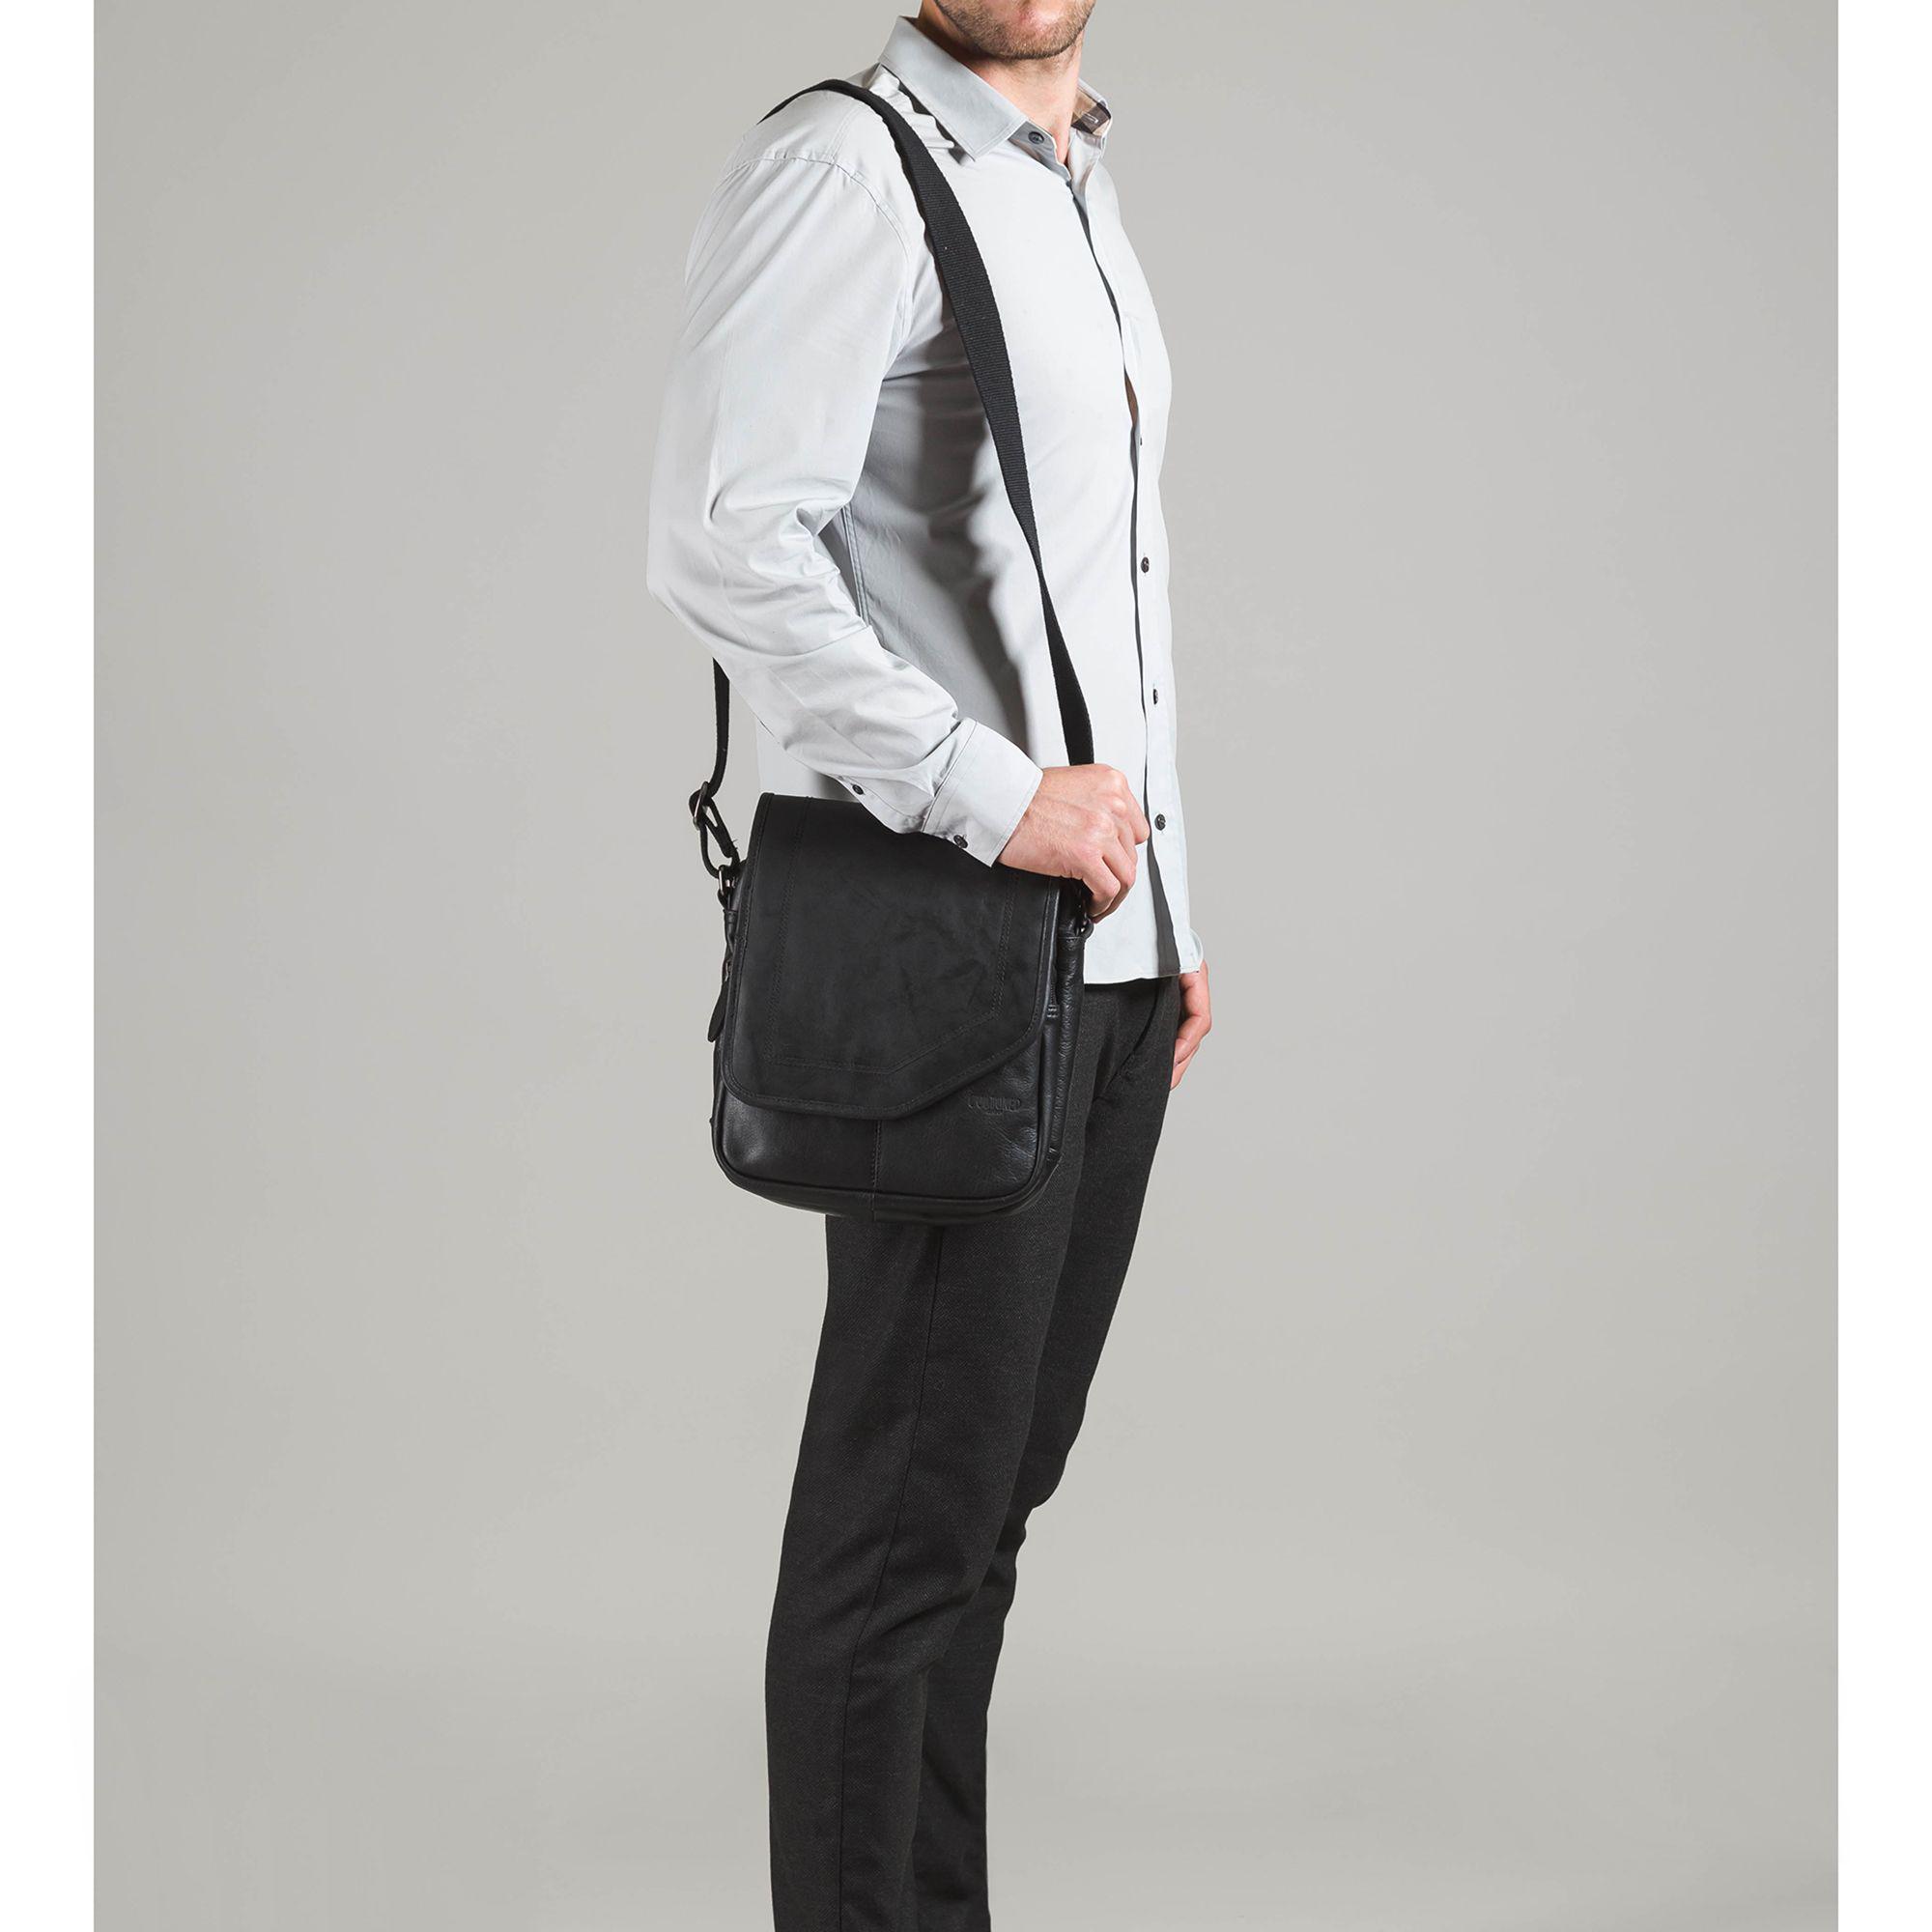 21a7d7085b Despatch Bag for Men - Lyst. View fullscreen  newest 2deed 85d2c Conkca  London Vintage ...